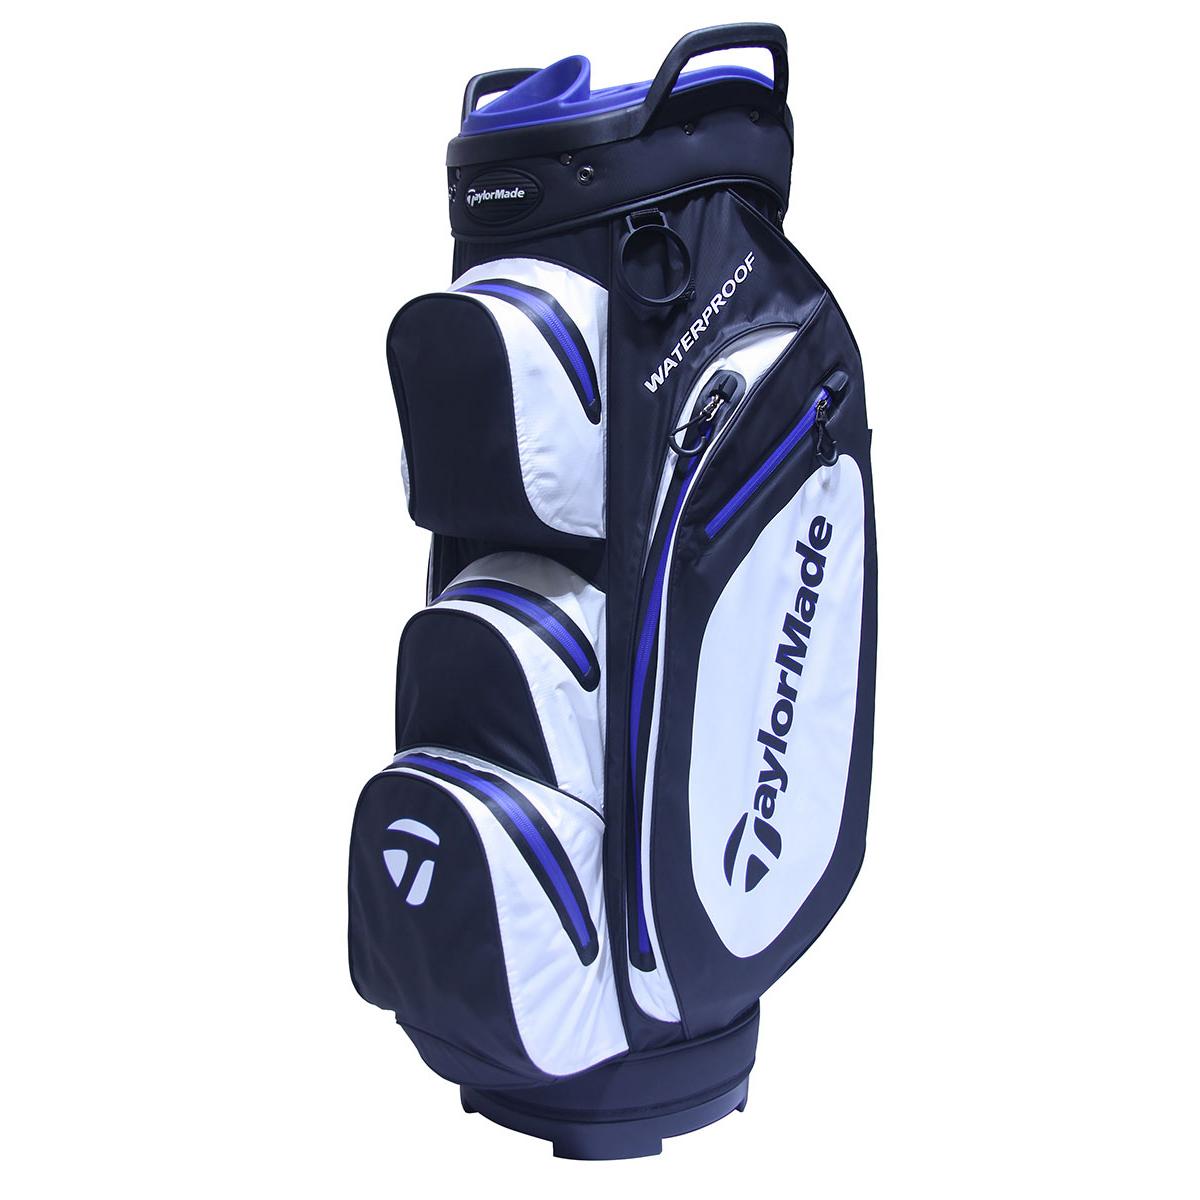 Taylormade Golf Bag >> Taylormade Waterproof Cart Bag